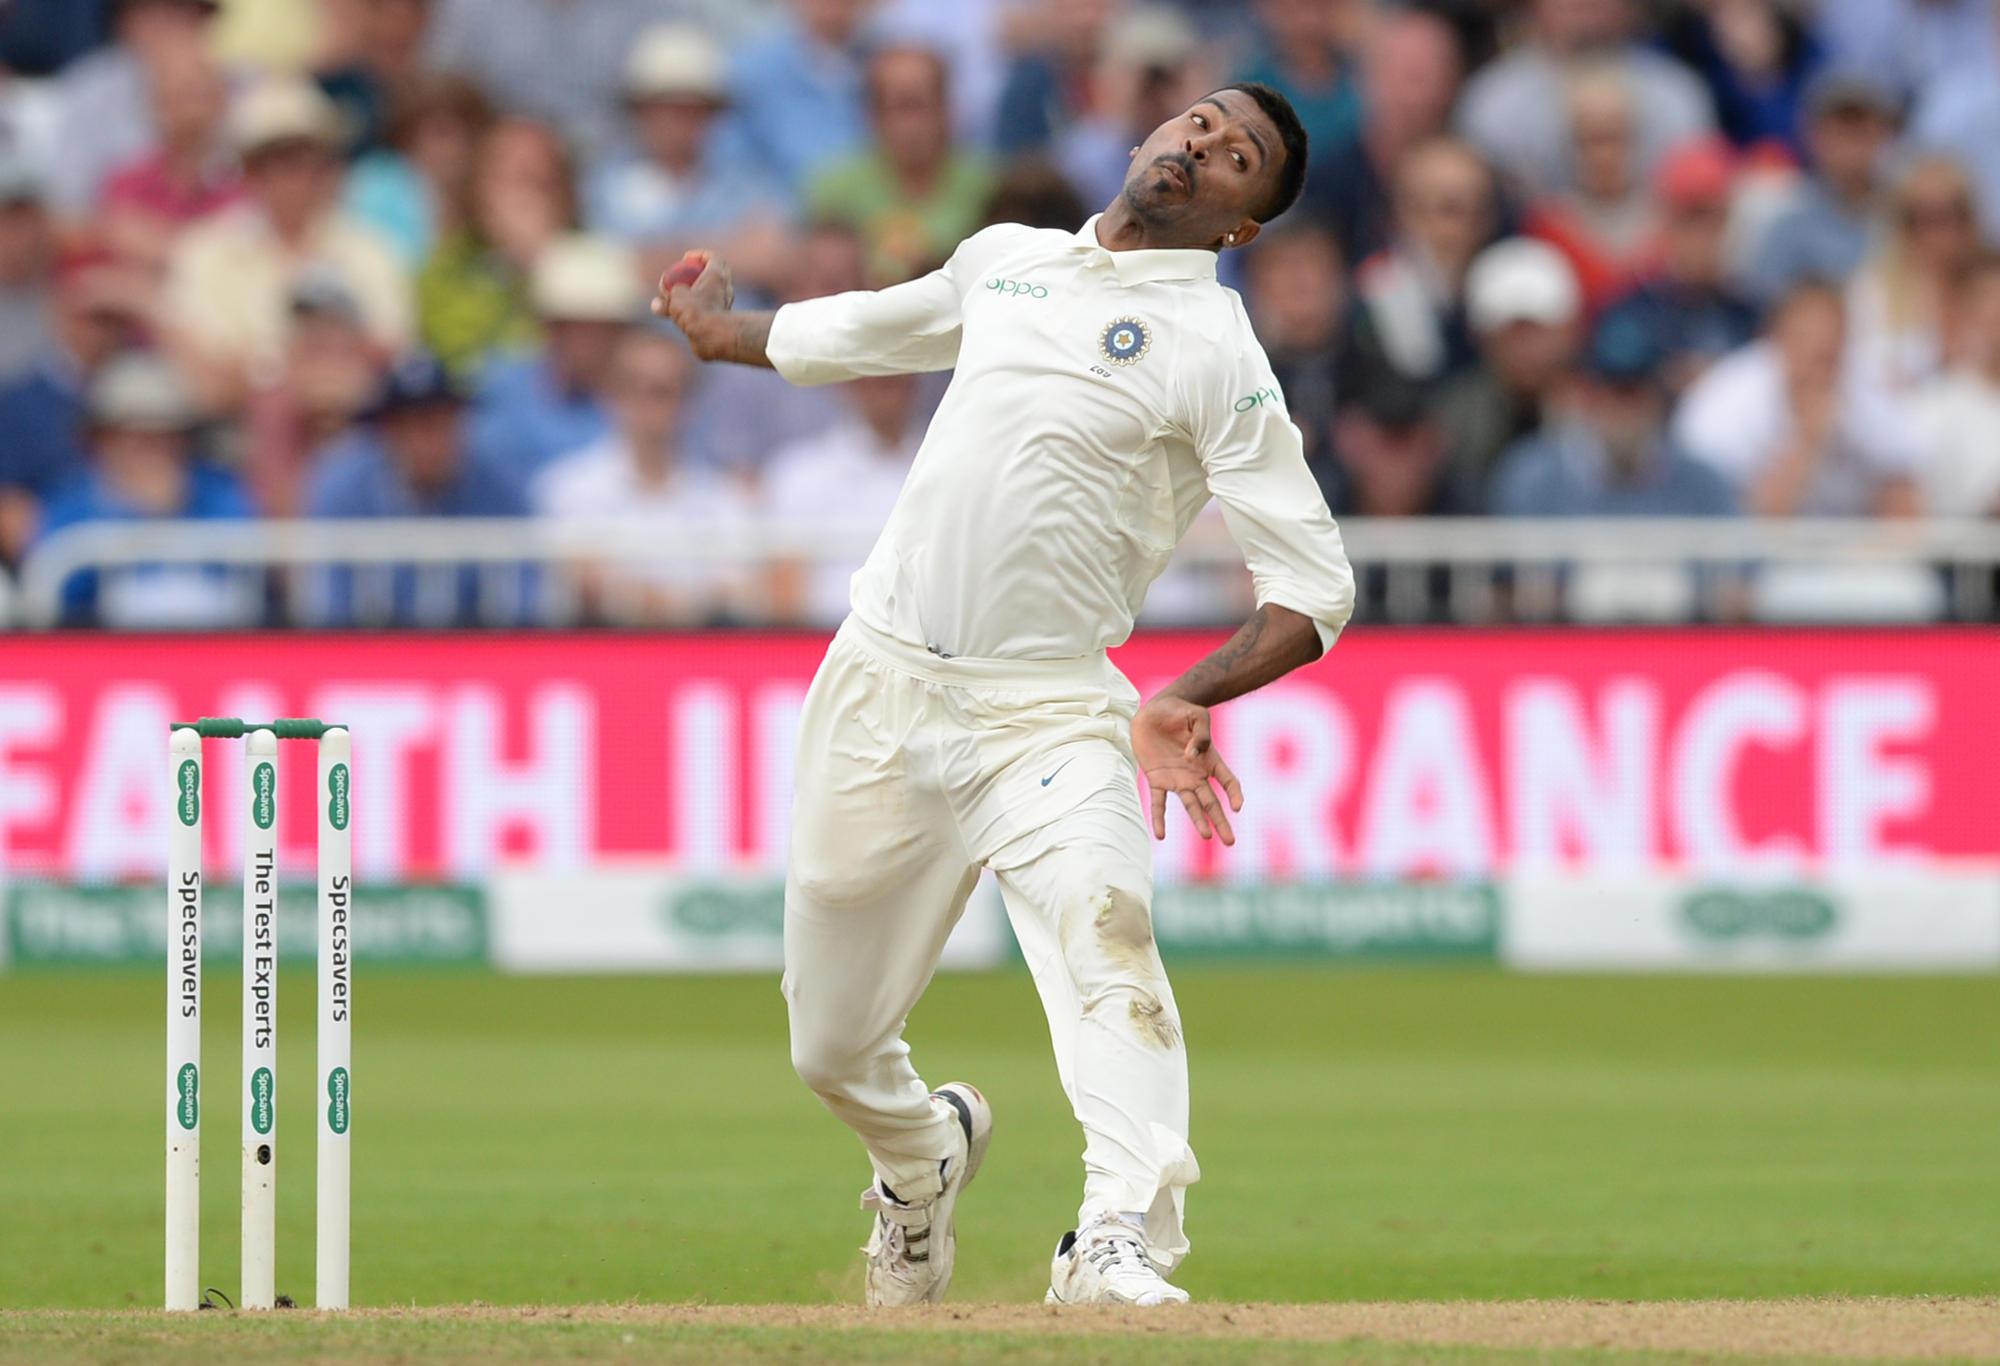 Hardik Pandya bowling for India.